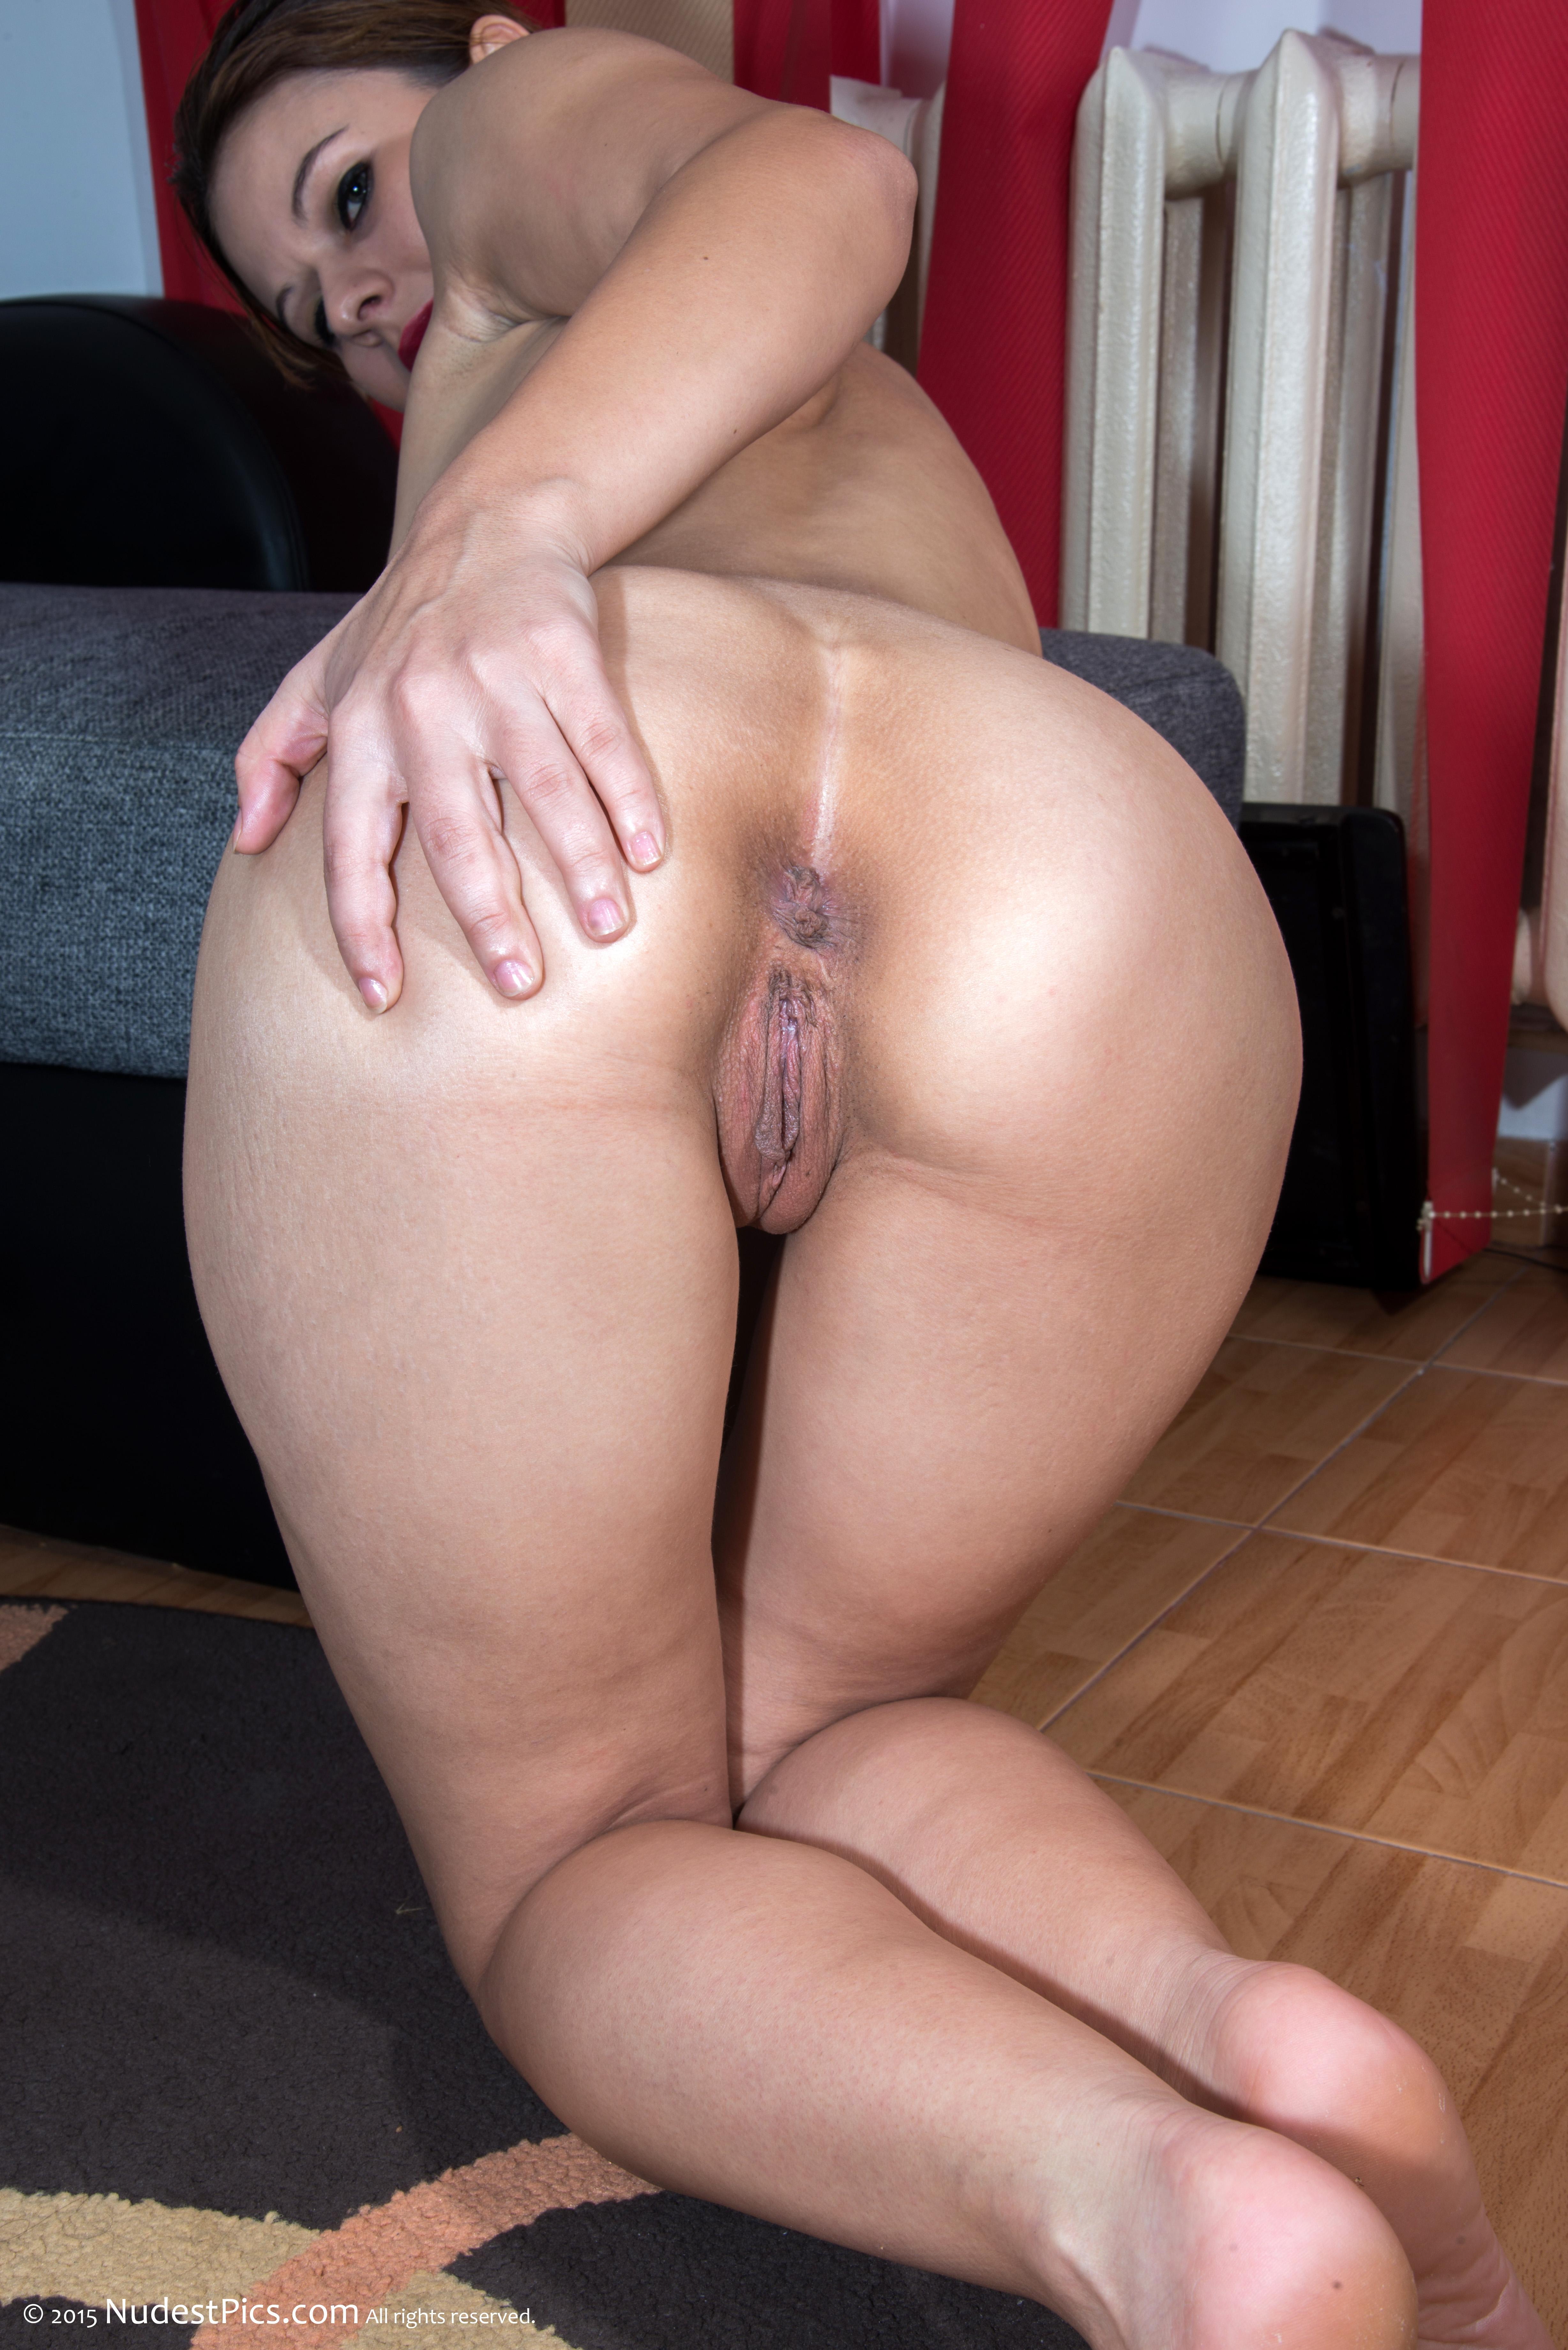 photos of naked italian girls